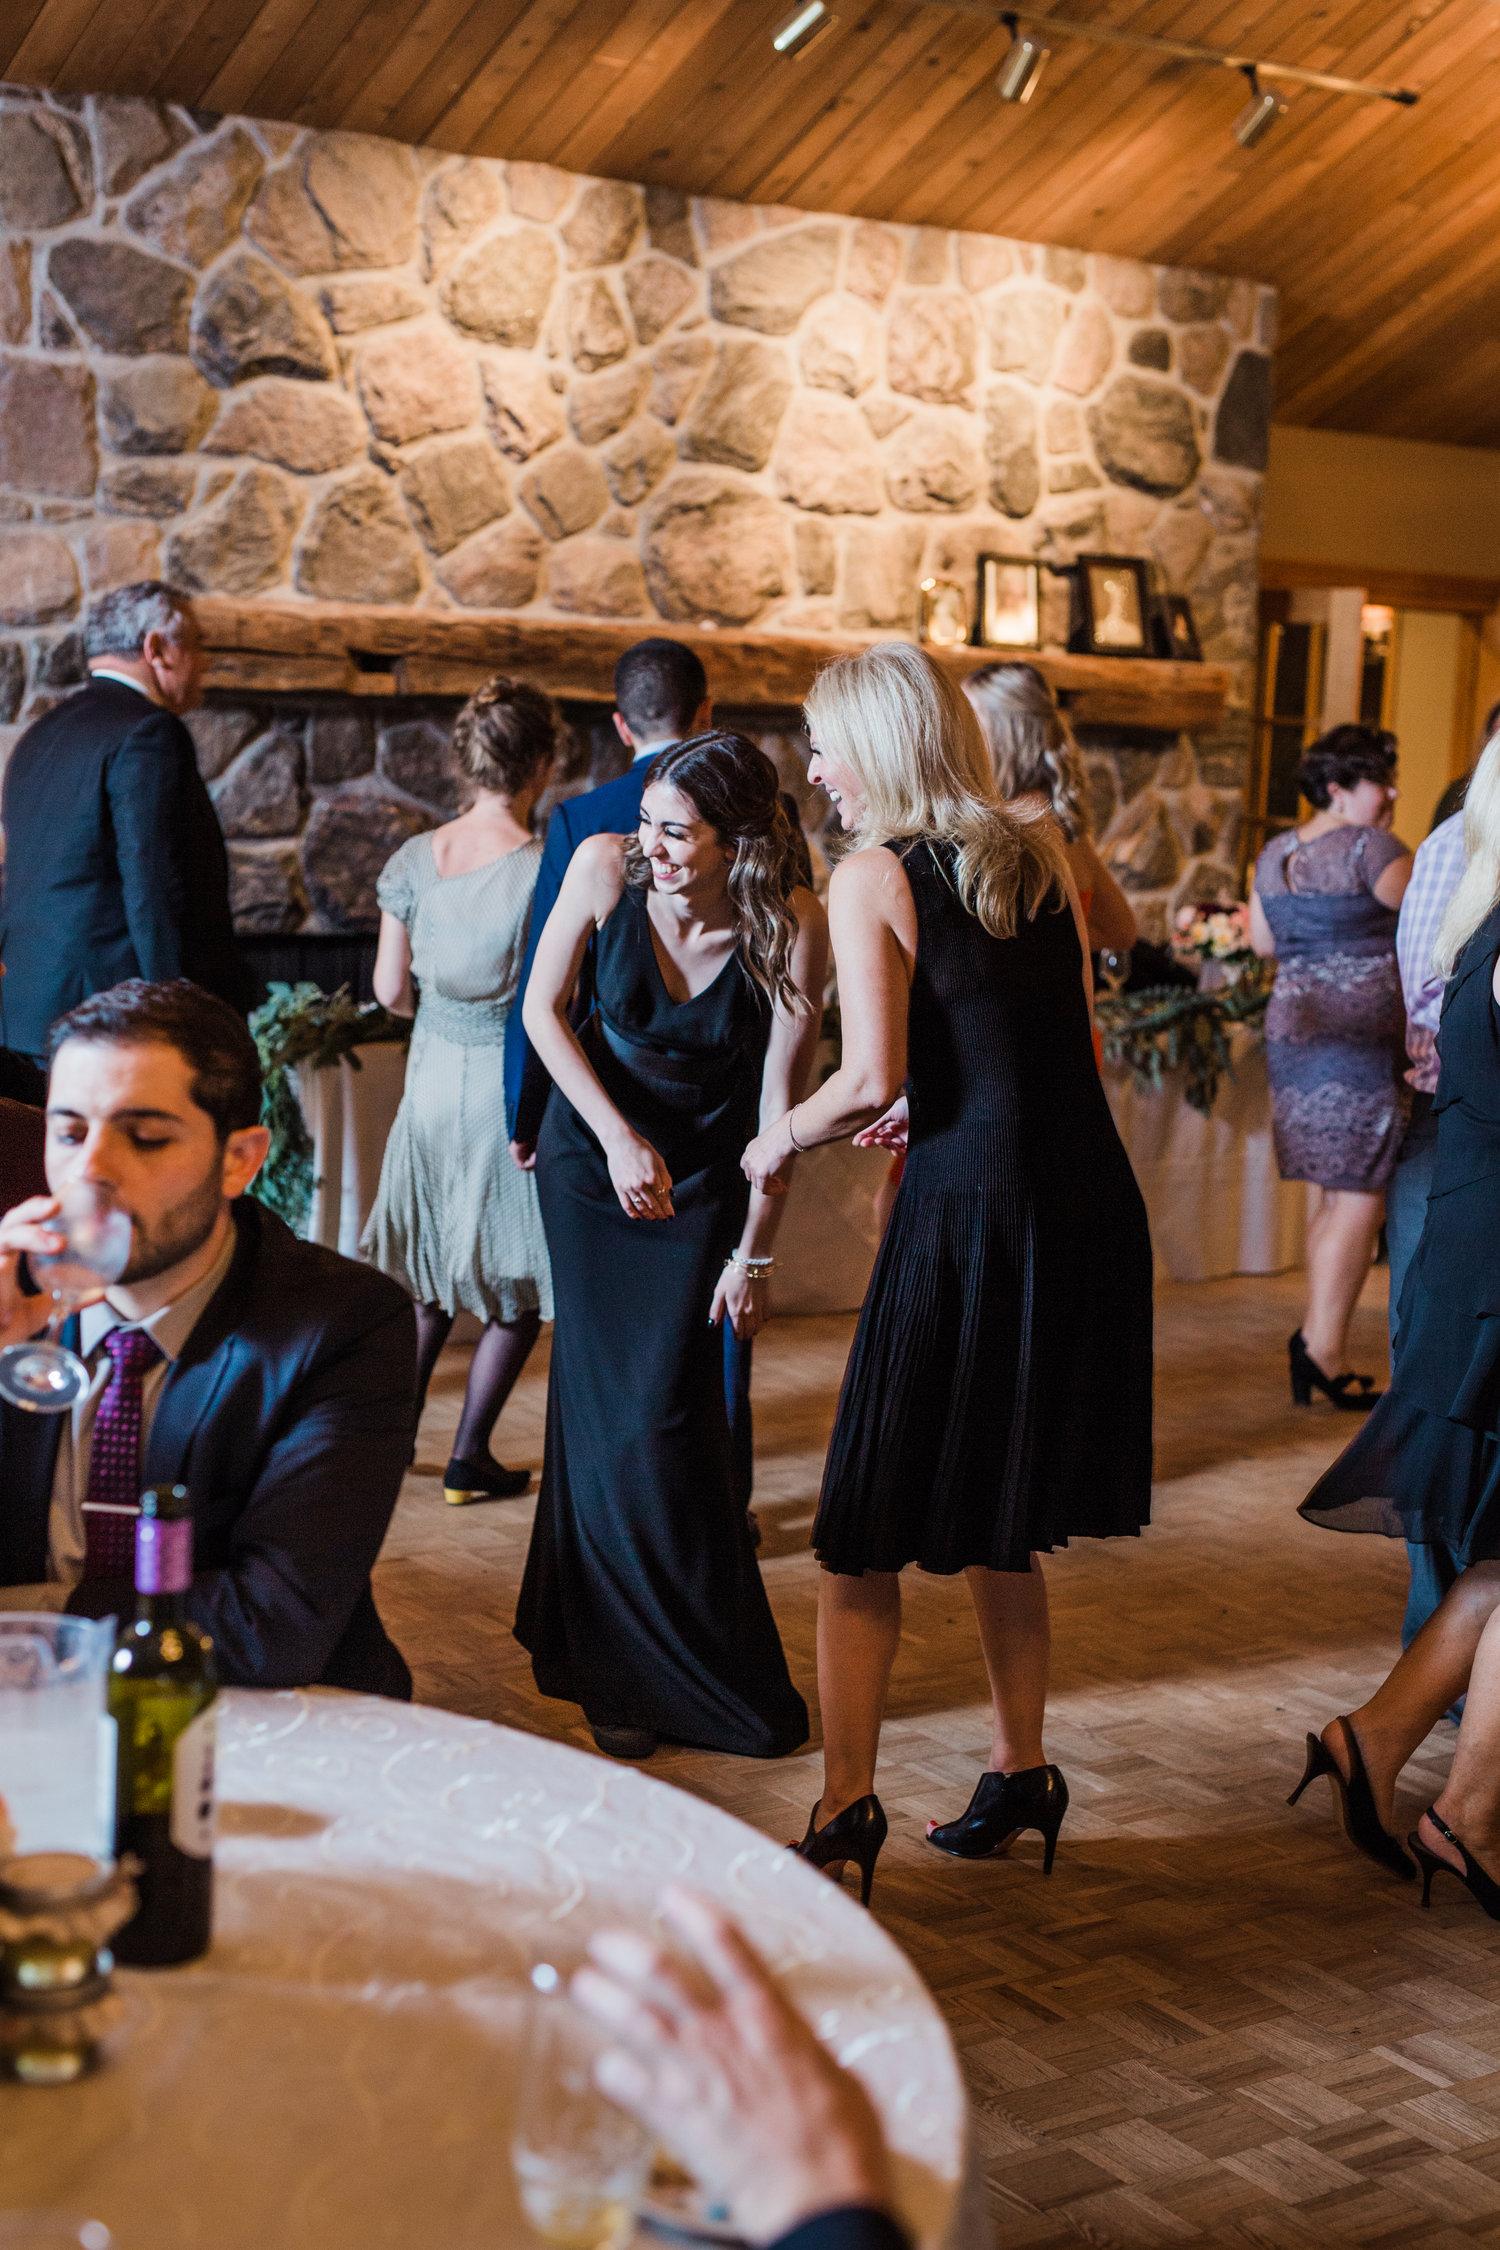 Amir-Golbazi-Danielle-Giroux-Photography_Toronto-Wedding_Cedarwood_Rachel-Paul_839.jpg